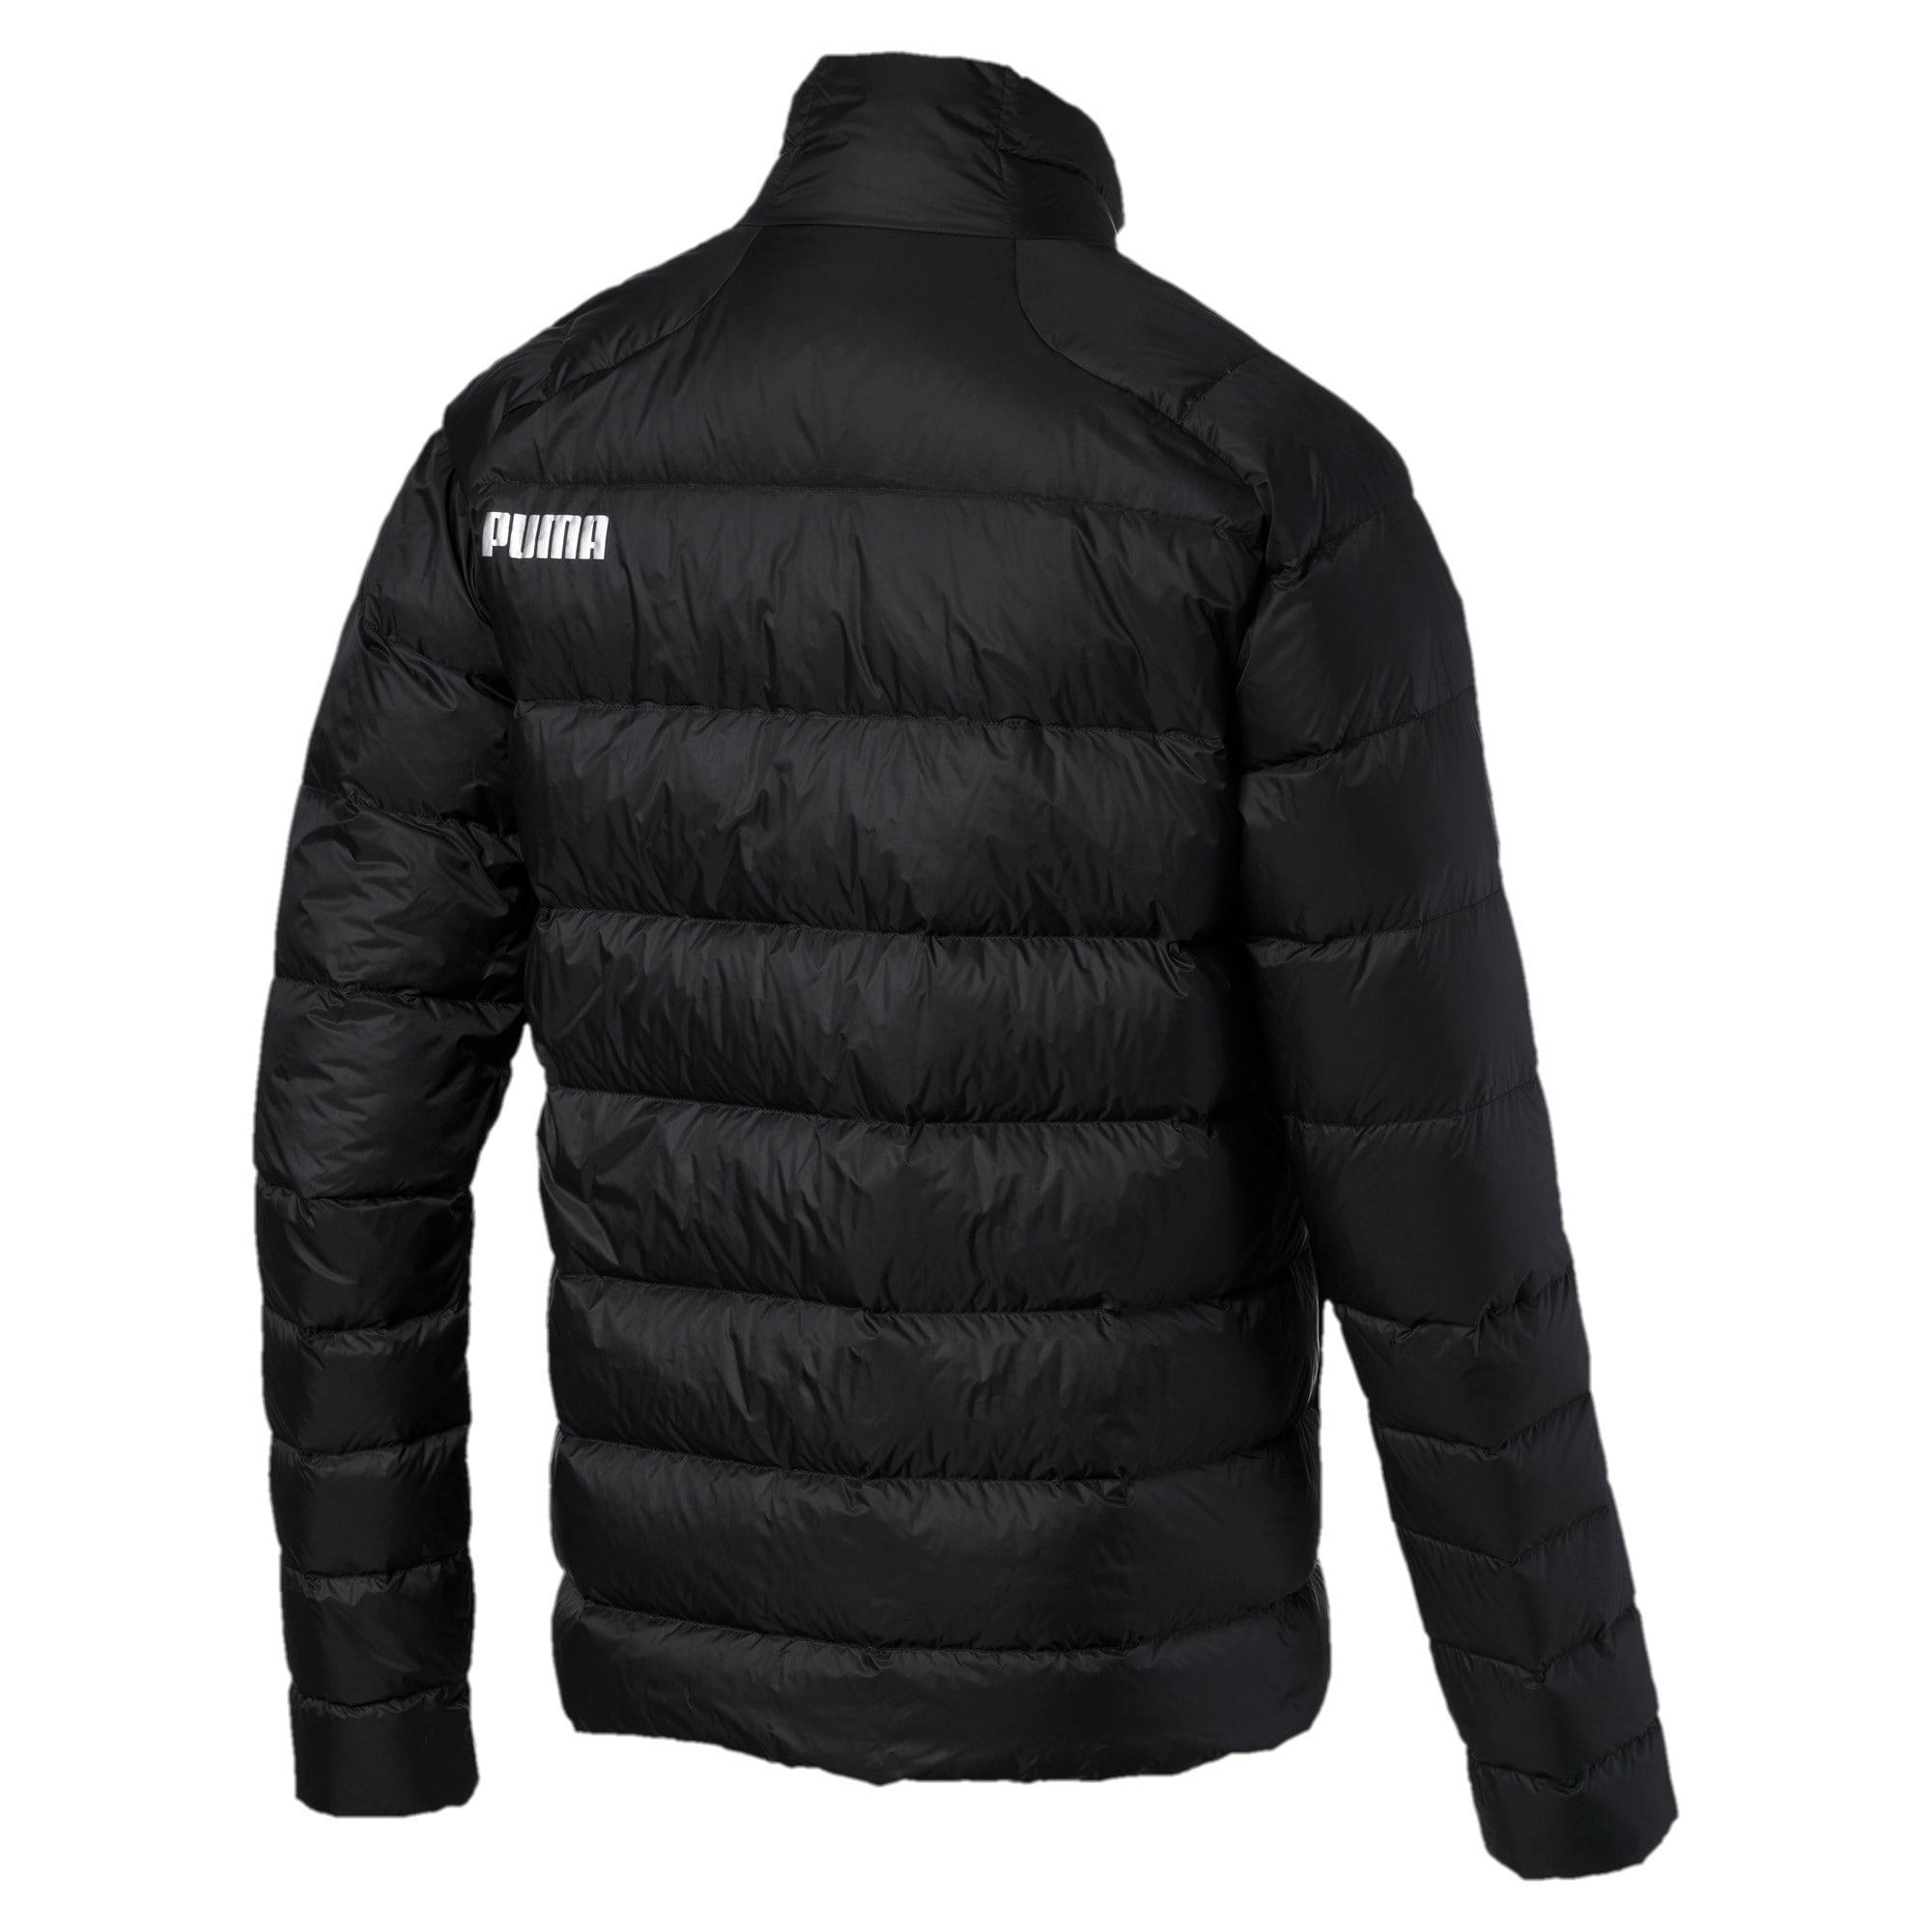 Thumbnail 5 of PWRWarm packLITE 600 Down Men's Jacket, Puma Black, medium